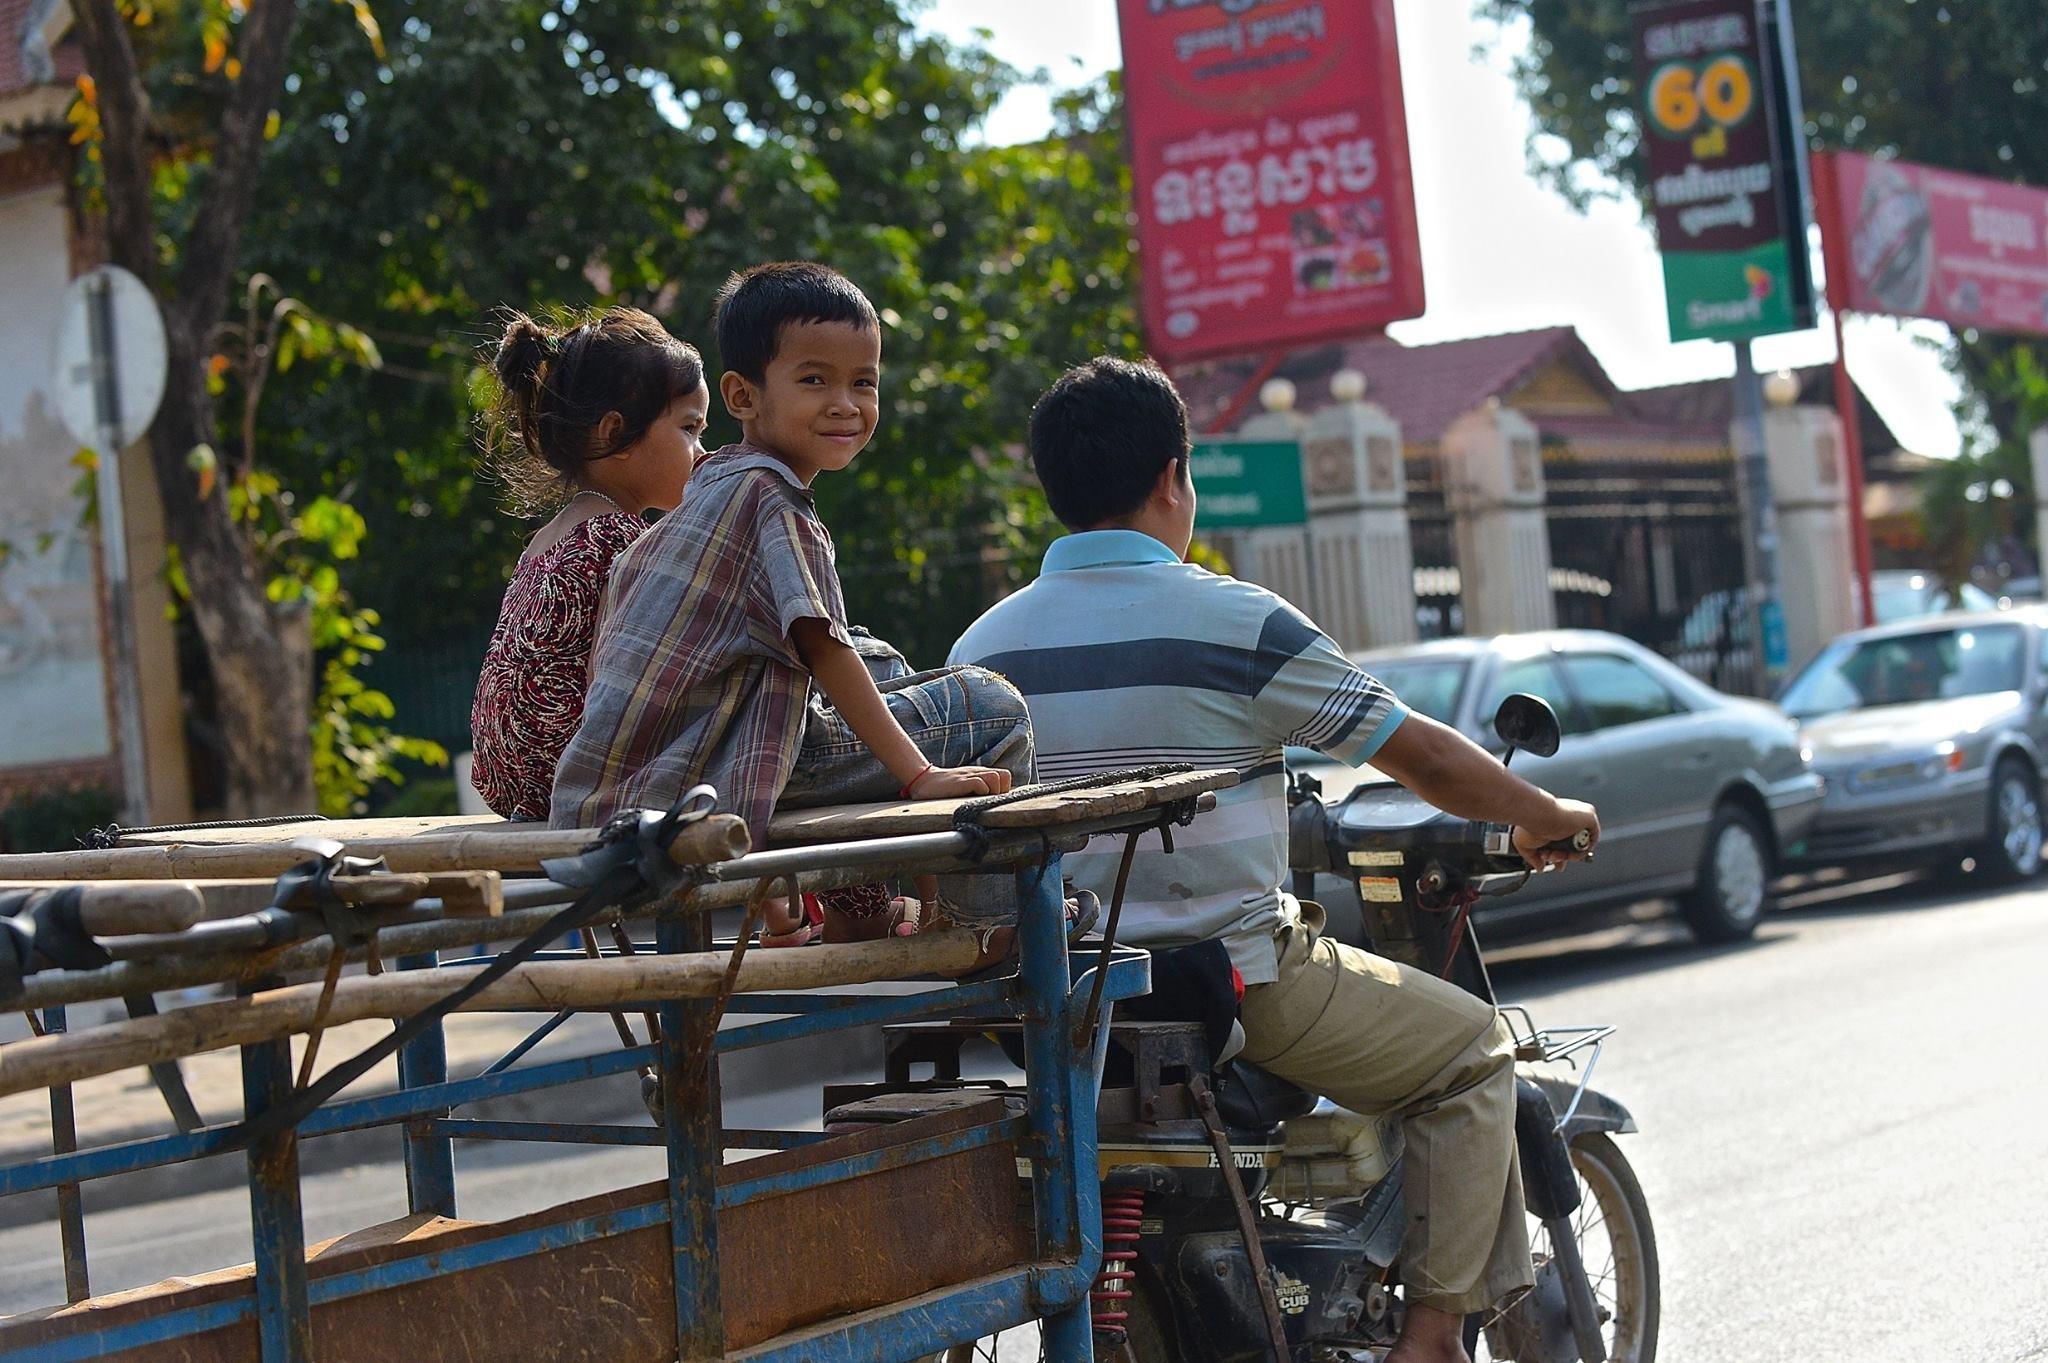 Cambodia 2018 by Robert Malin Young